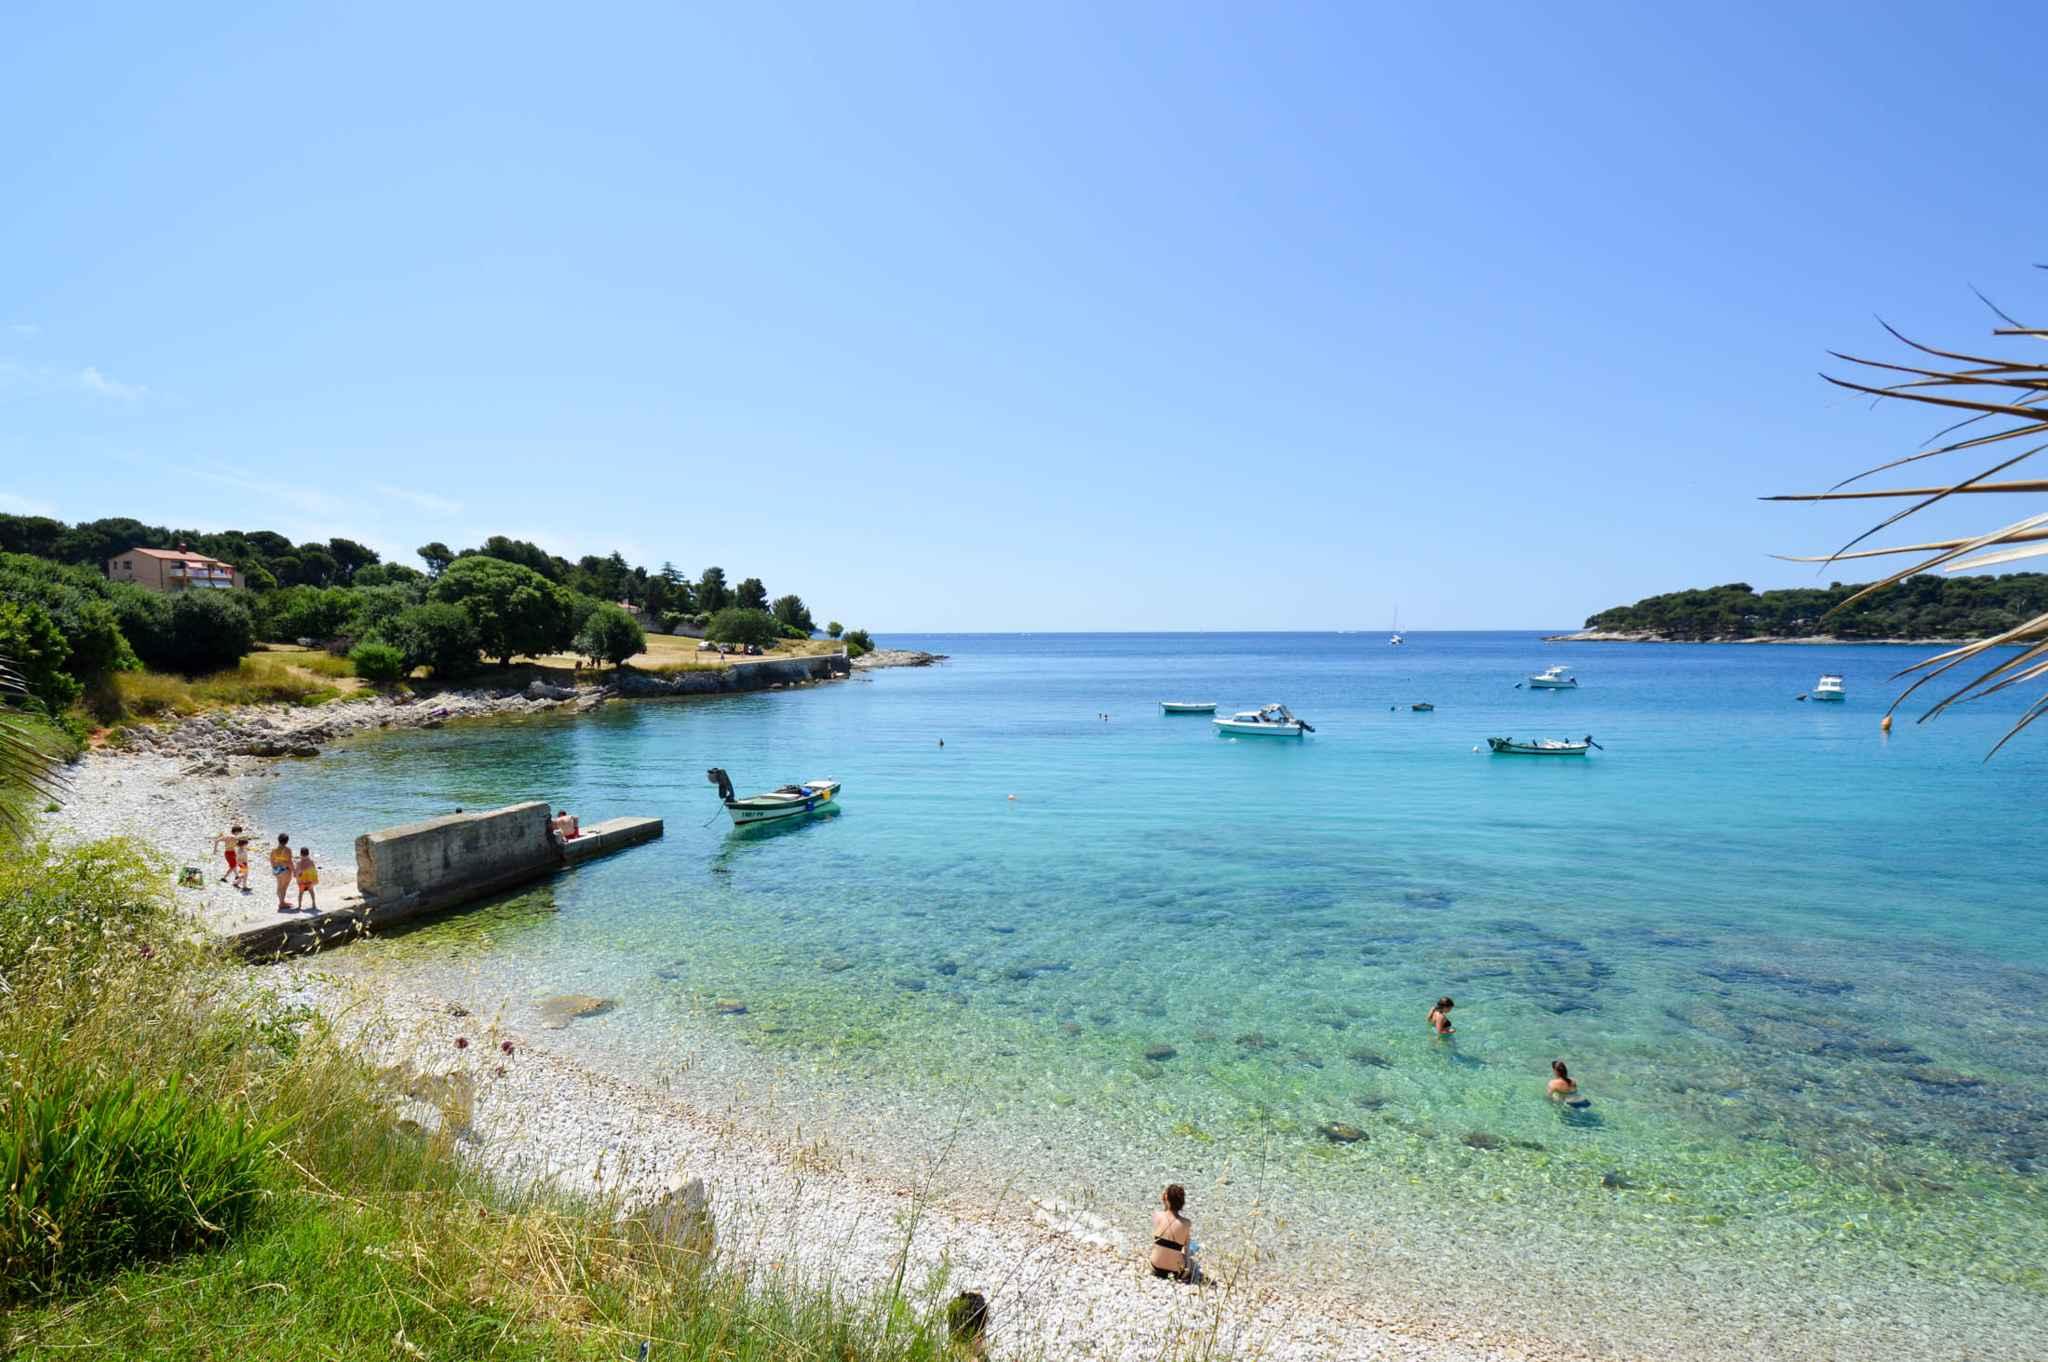 Ferienwohnung direkt am Meer gelegen (280674), Pula, , Istrien, Kroatien, Bild 14